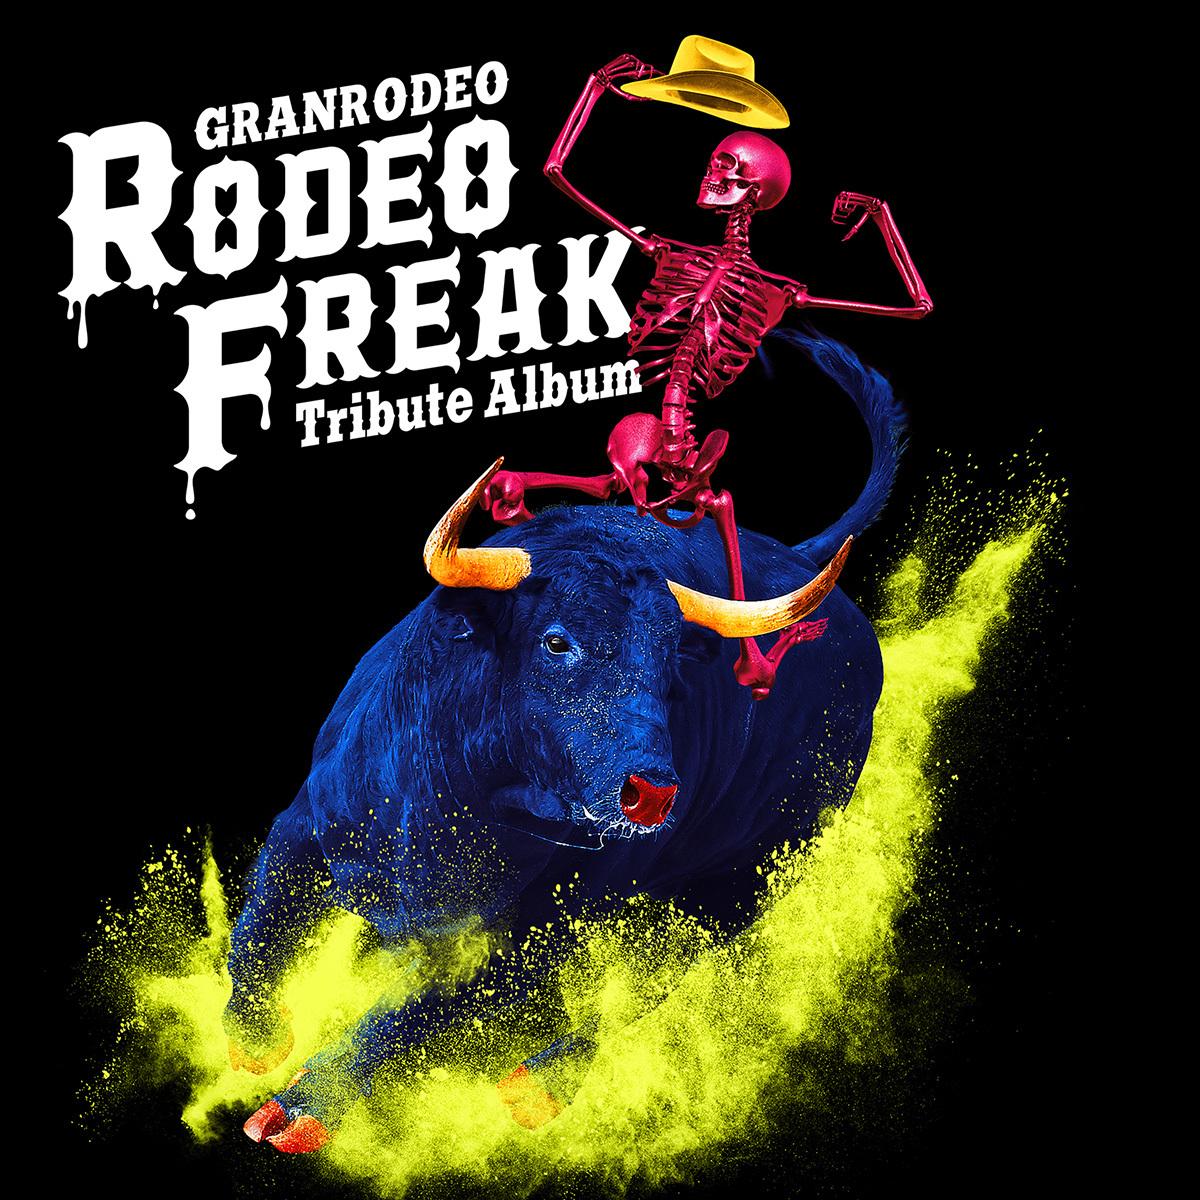 『GRANRODEO Tribute Album RODEO FREAK』ジャケット